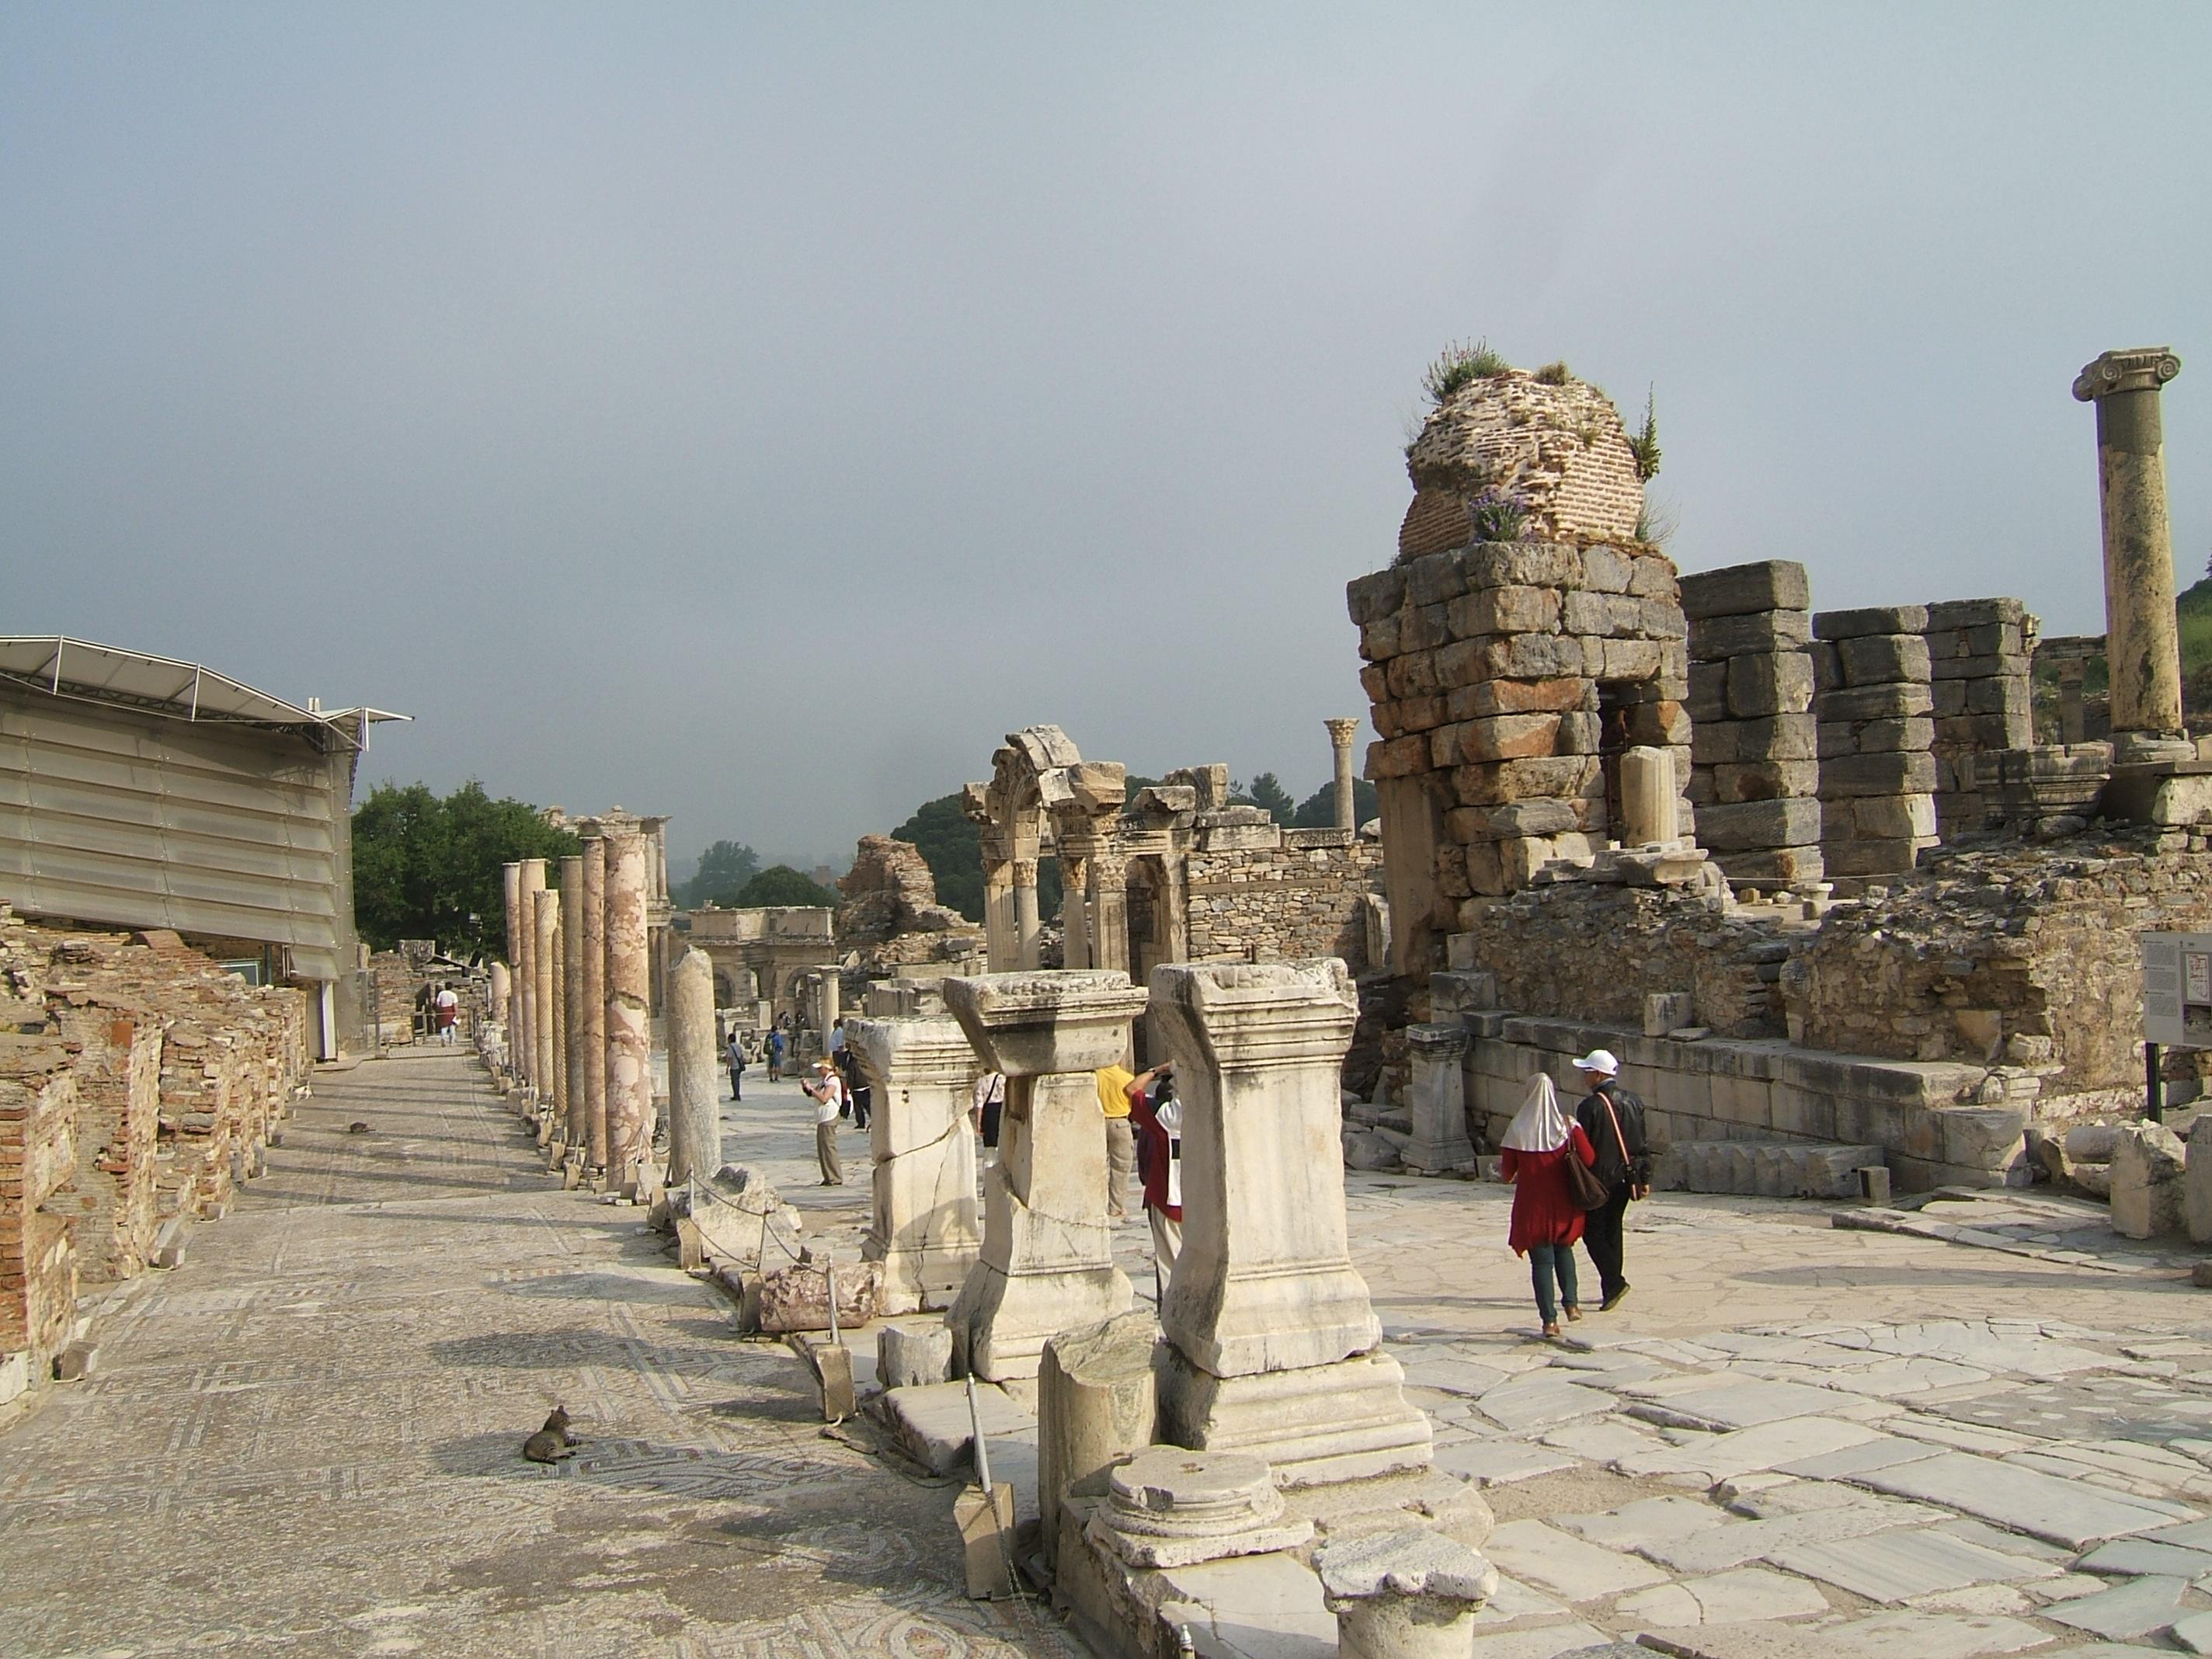 Cruise to turkey ultimate ephesus sunny sky blue - Ephesus turkey cruise port ...